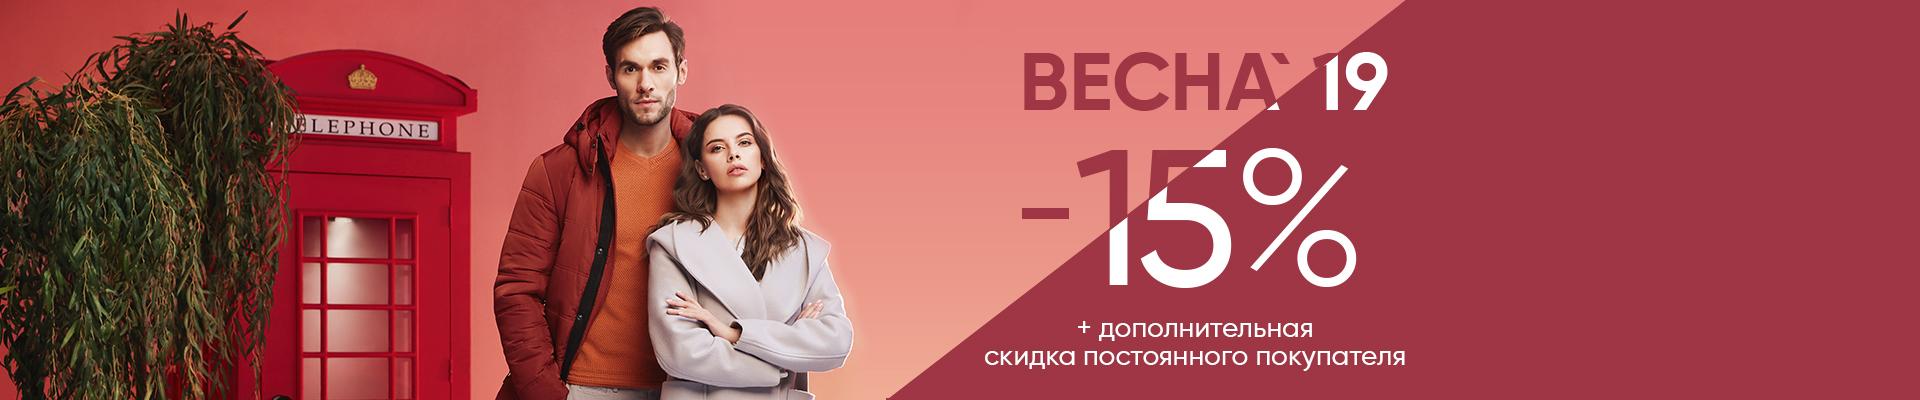 Baon - каталог 2018-2019 в интернет магазине WildBerries.ru 01baae83fbc